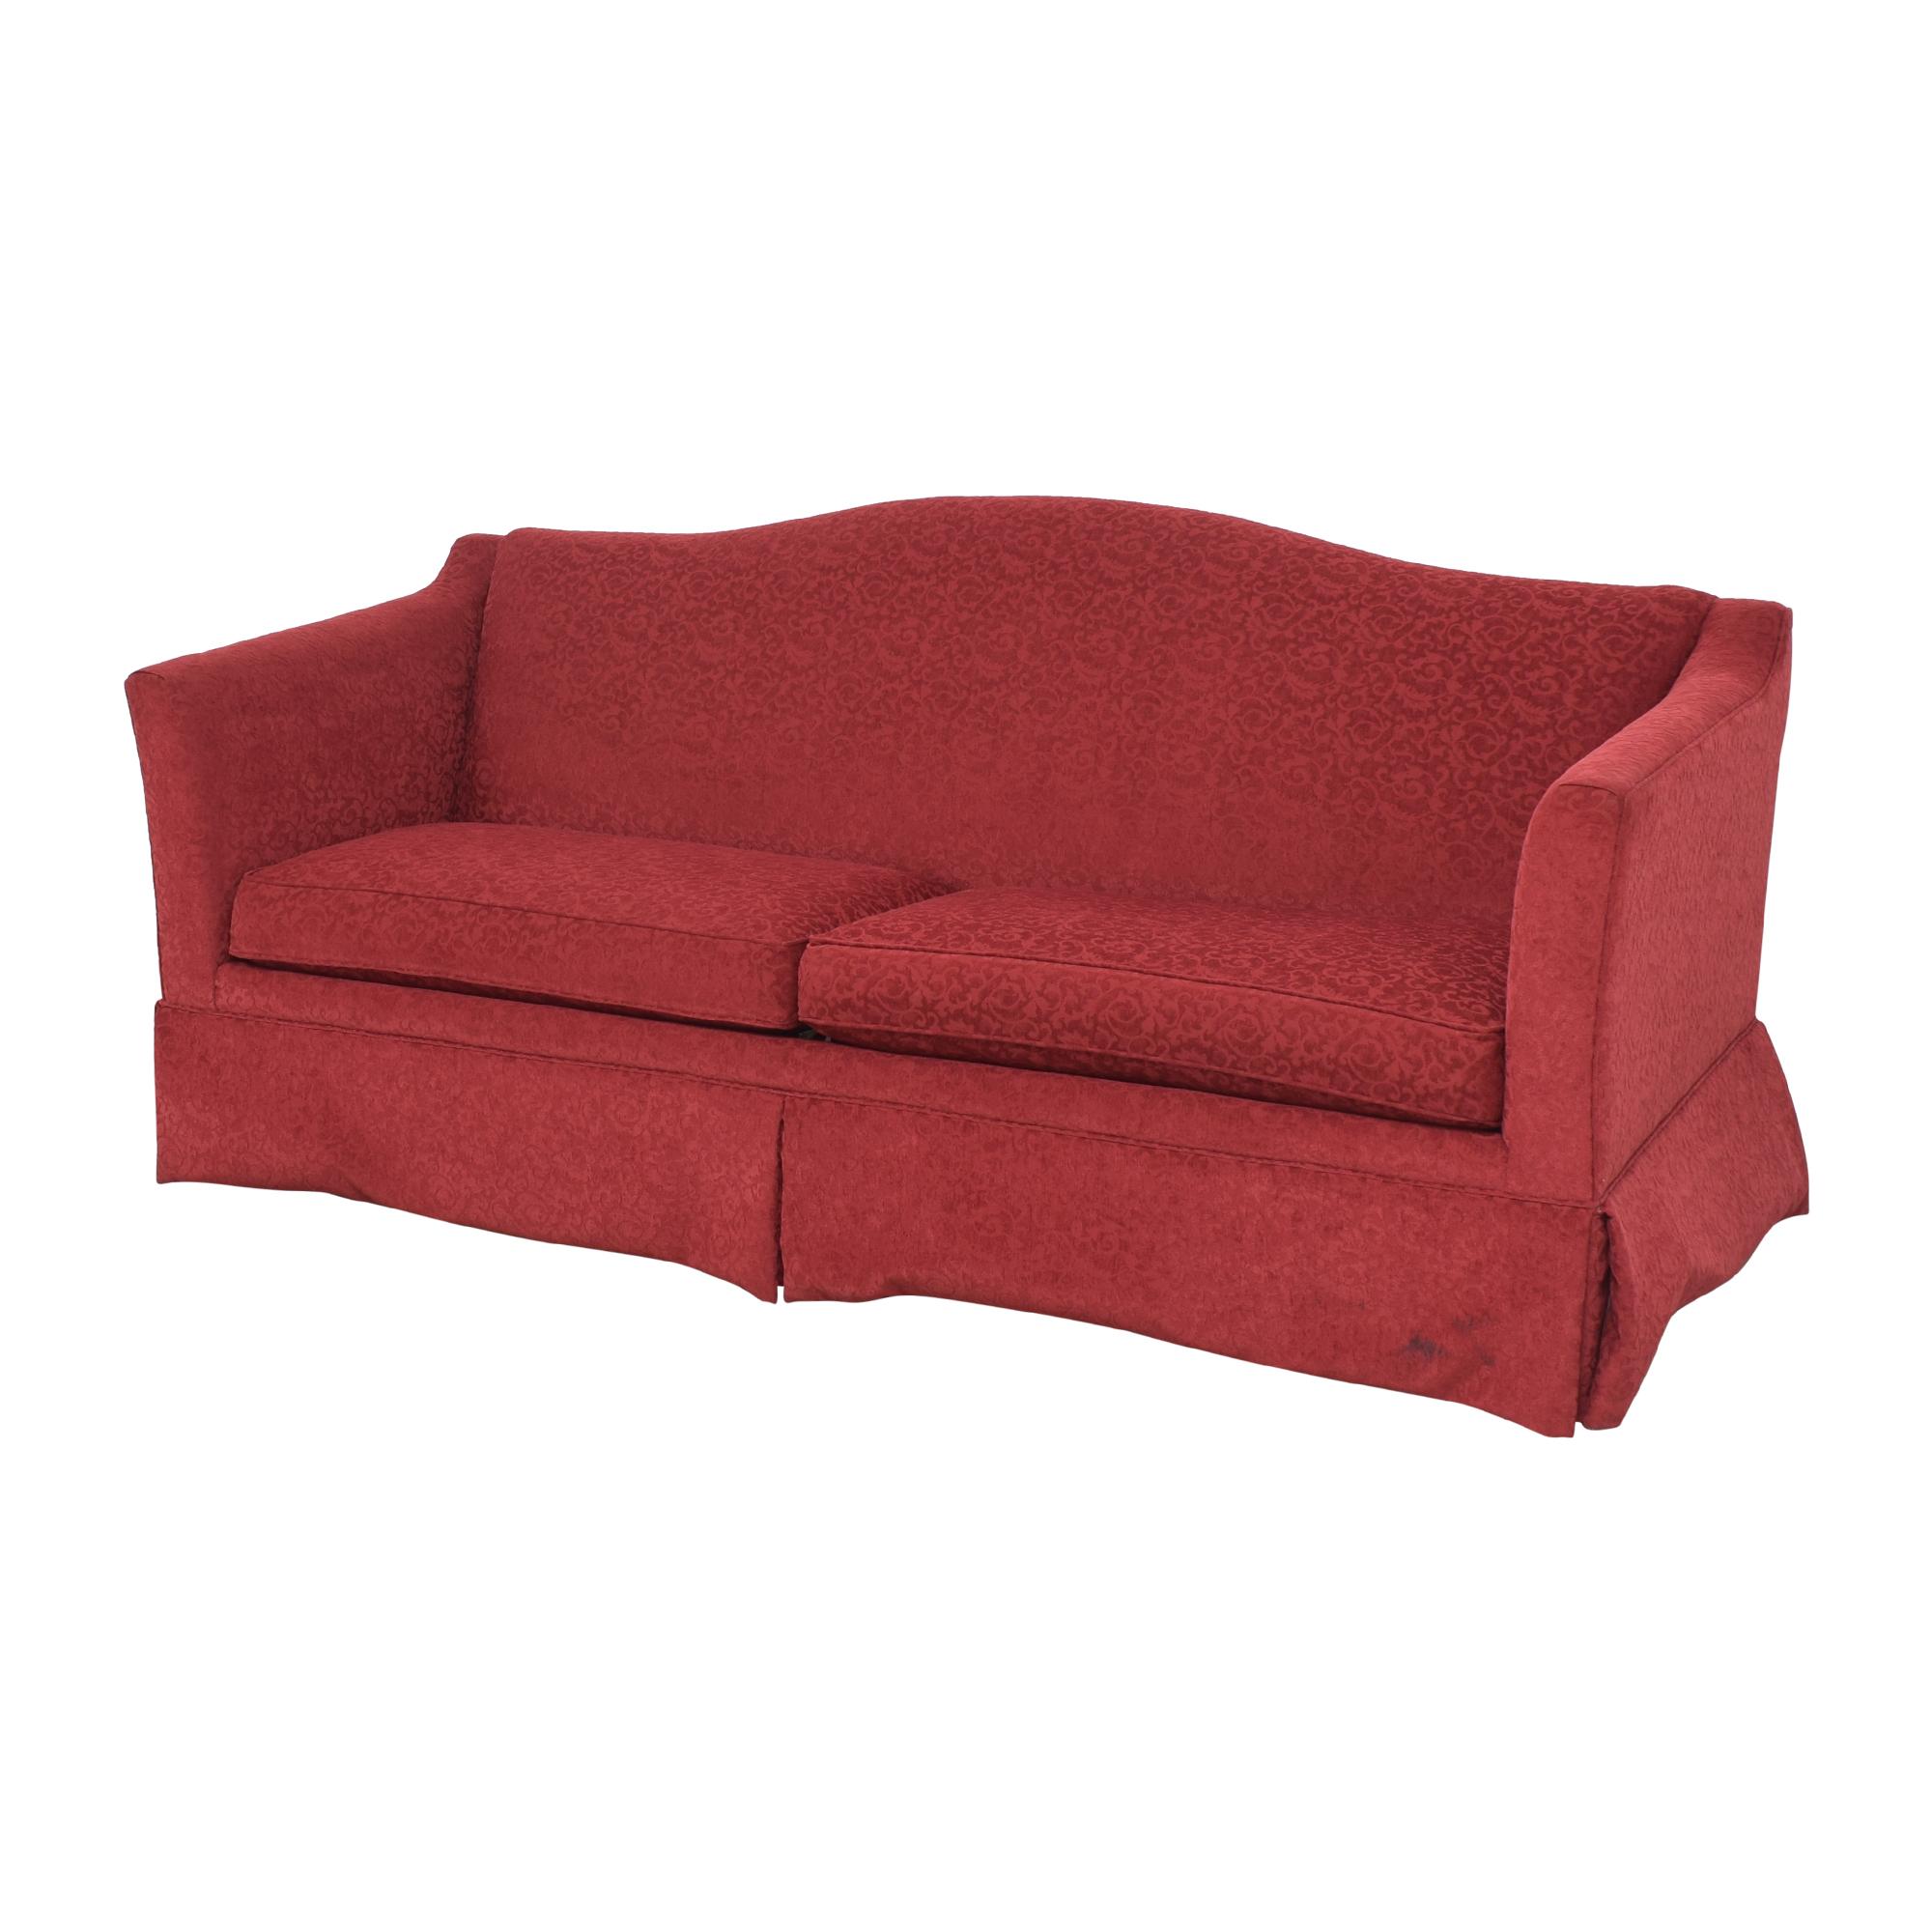 Ethan Allen Ethan Allen Two Cushion Skirted Sofa used